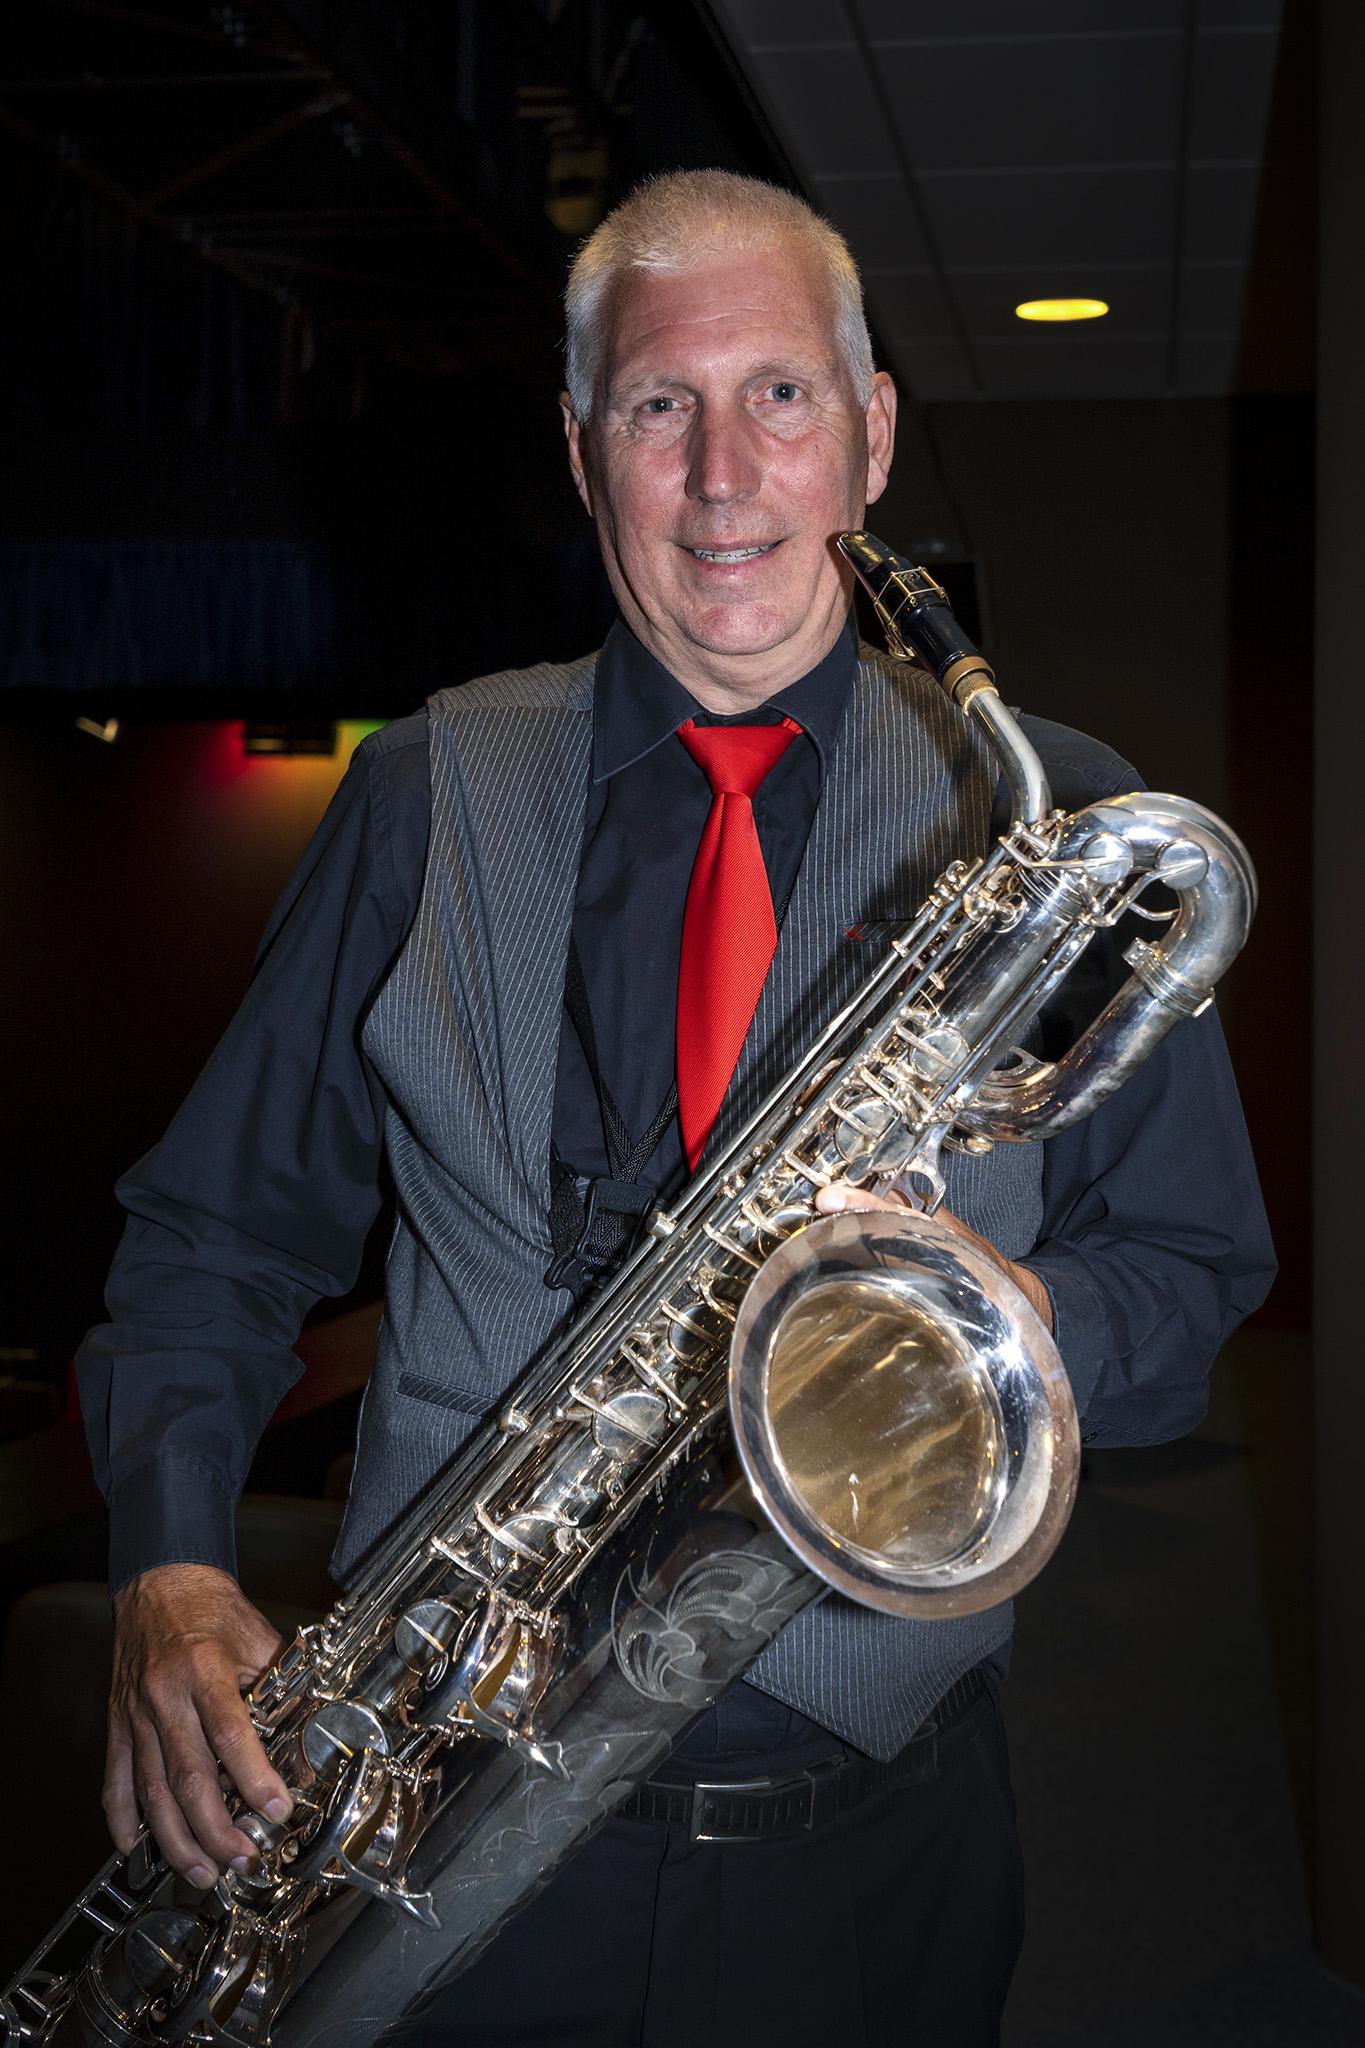 Frank van Bergen Bariton Sax